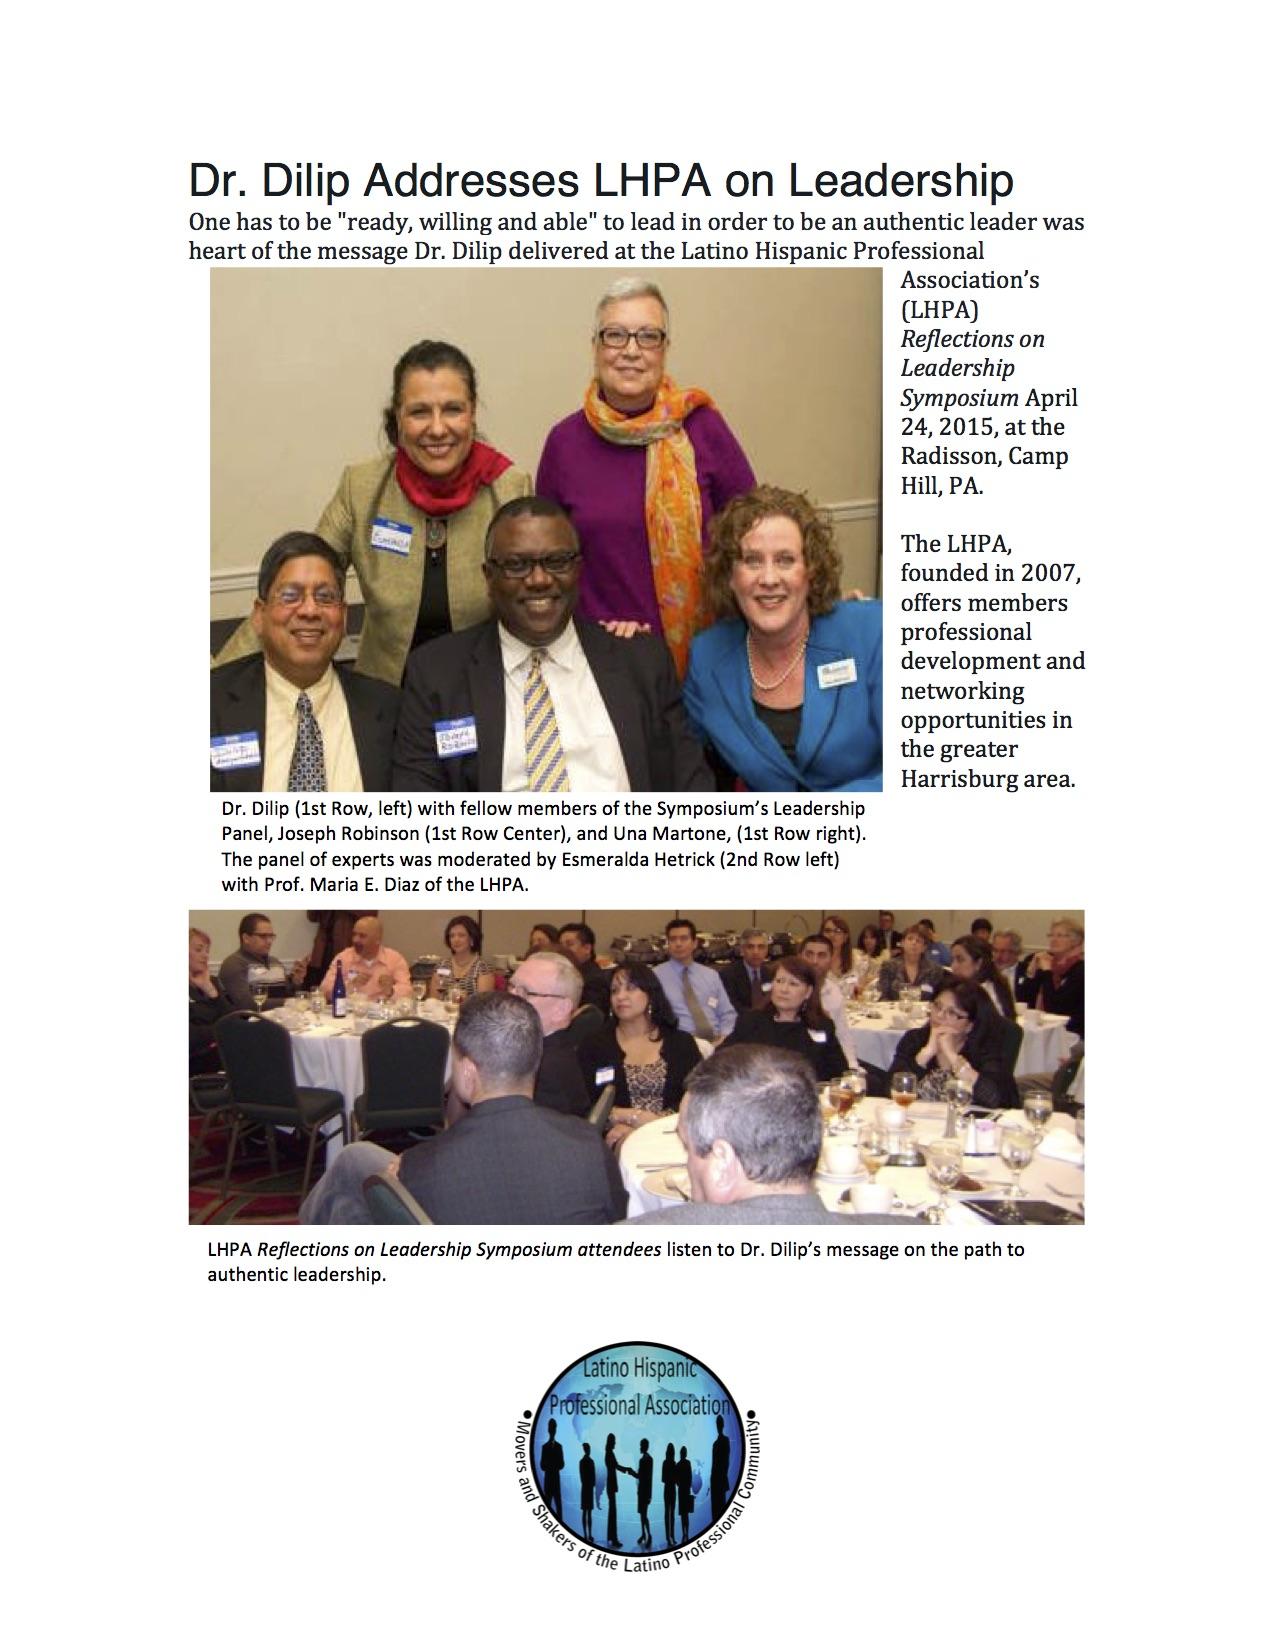 Leadership Symposium Latino Hispanic Professional Assoc. April 24, 2015